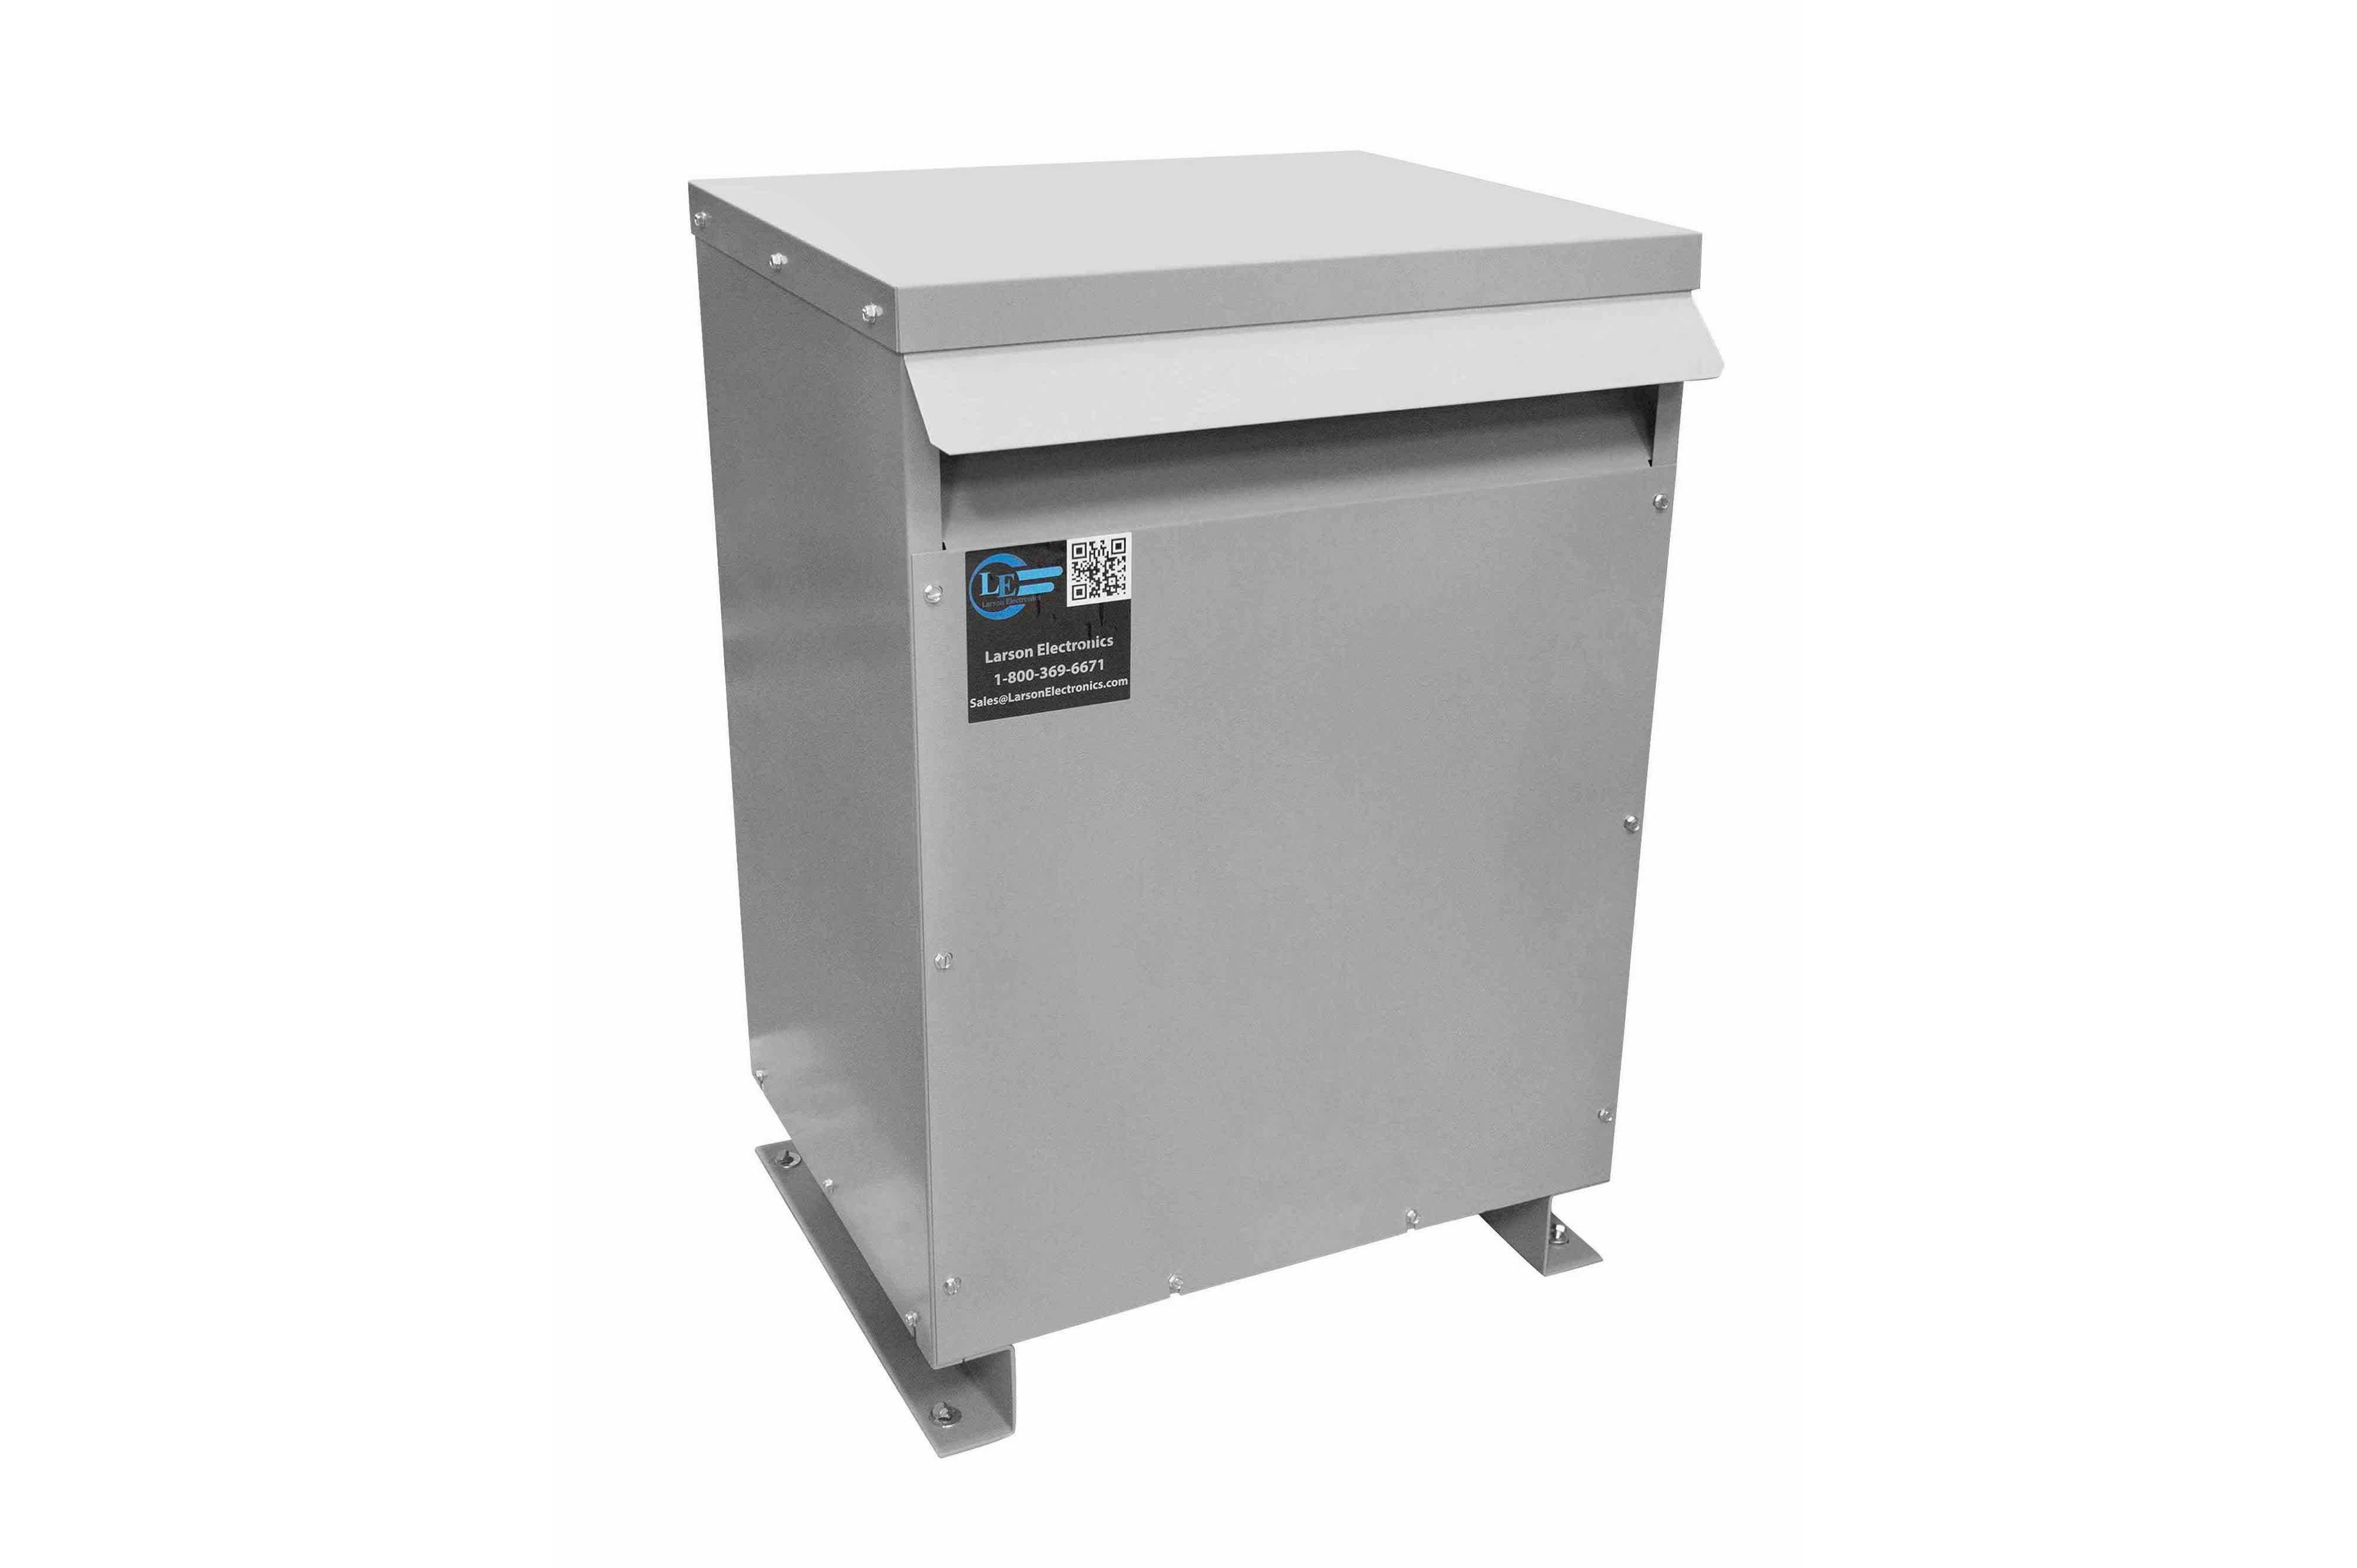 20 kVA 3PH Isolation Transformer, 480V Wye Primary, 208V Delta Secondary, N3R, Ventilated, 60 Hz